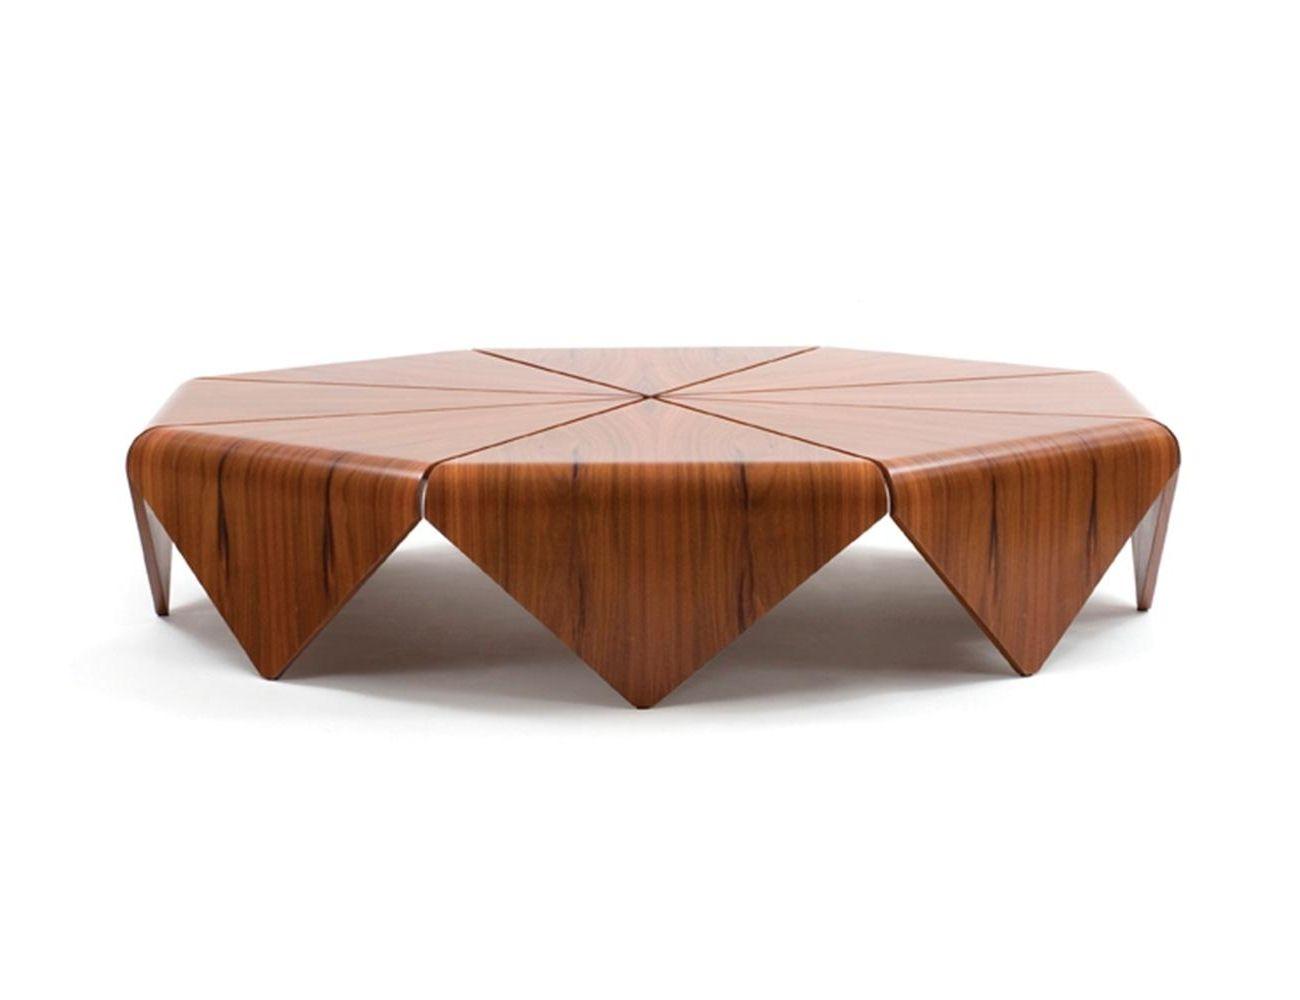 Mesa Petala Jorge Zalszupin Modern Wood Furniture Iconic Furniture Design Furniture [ 1000 x 1300 Pixel ]